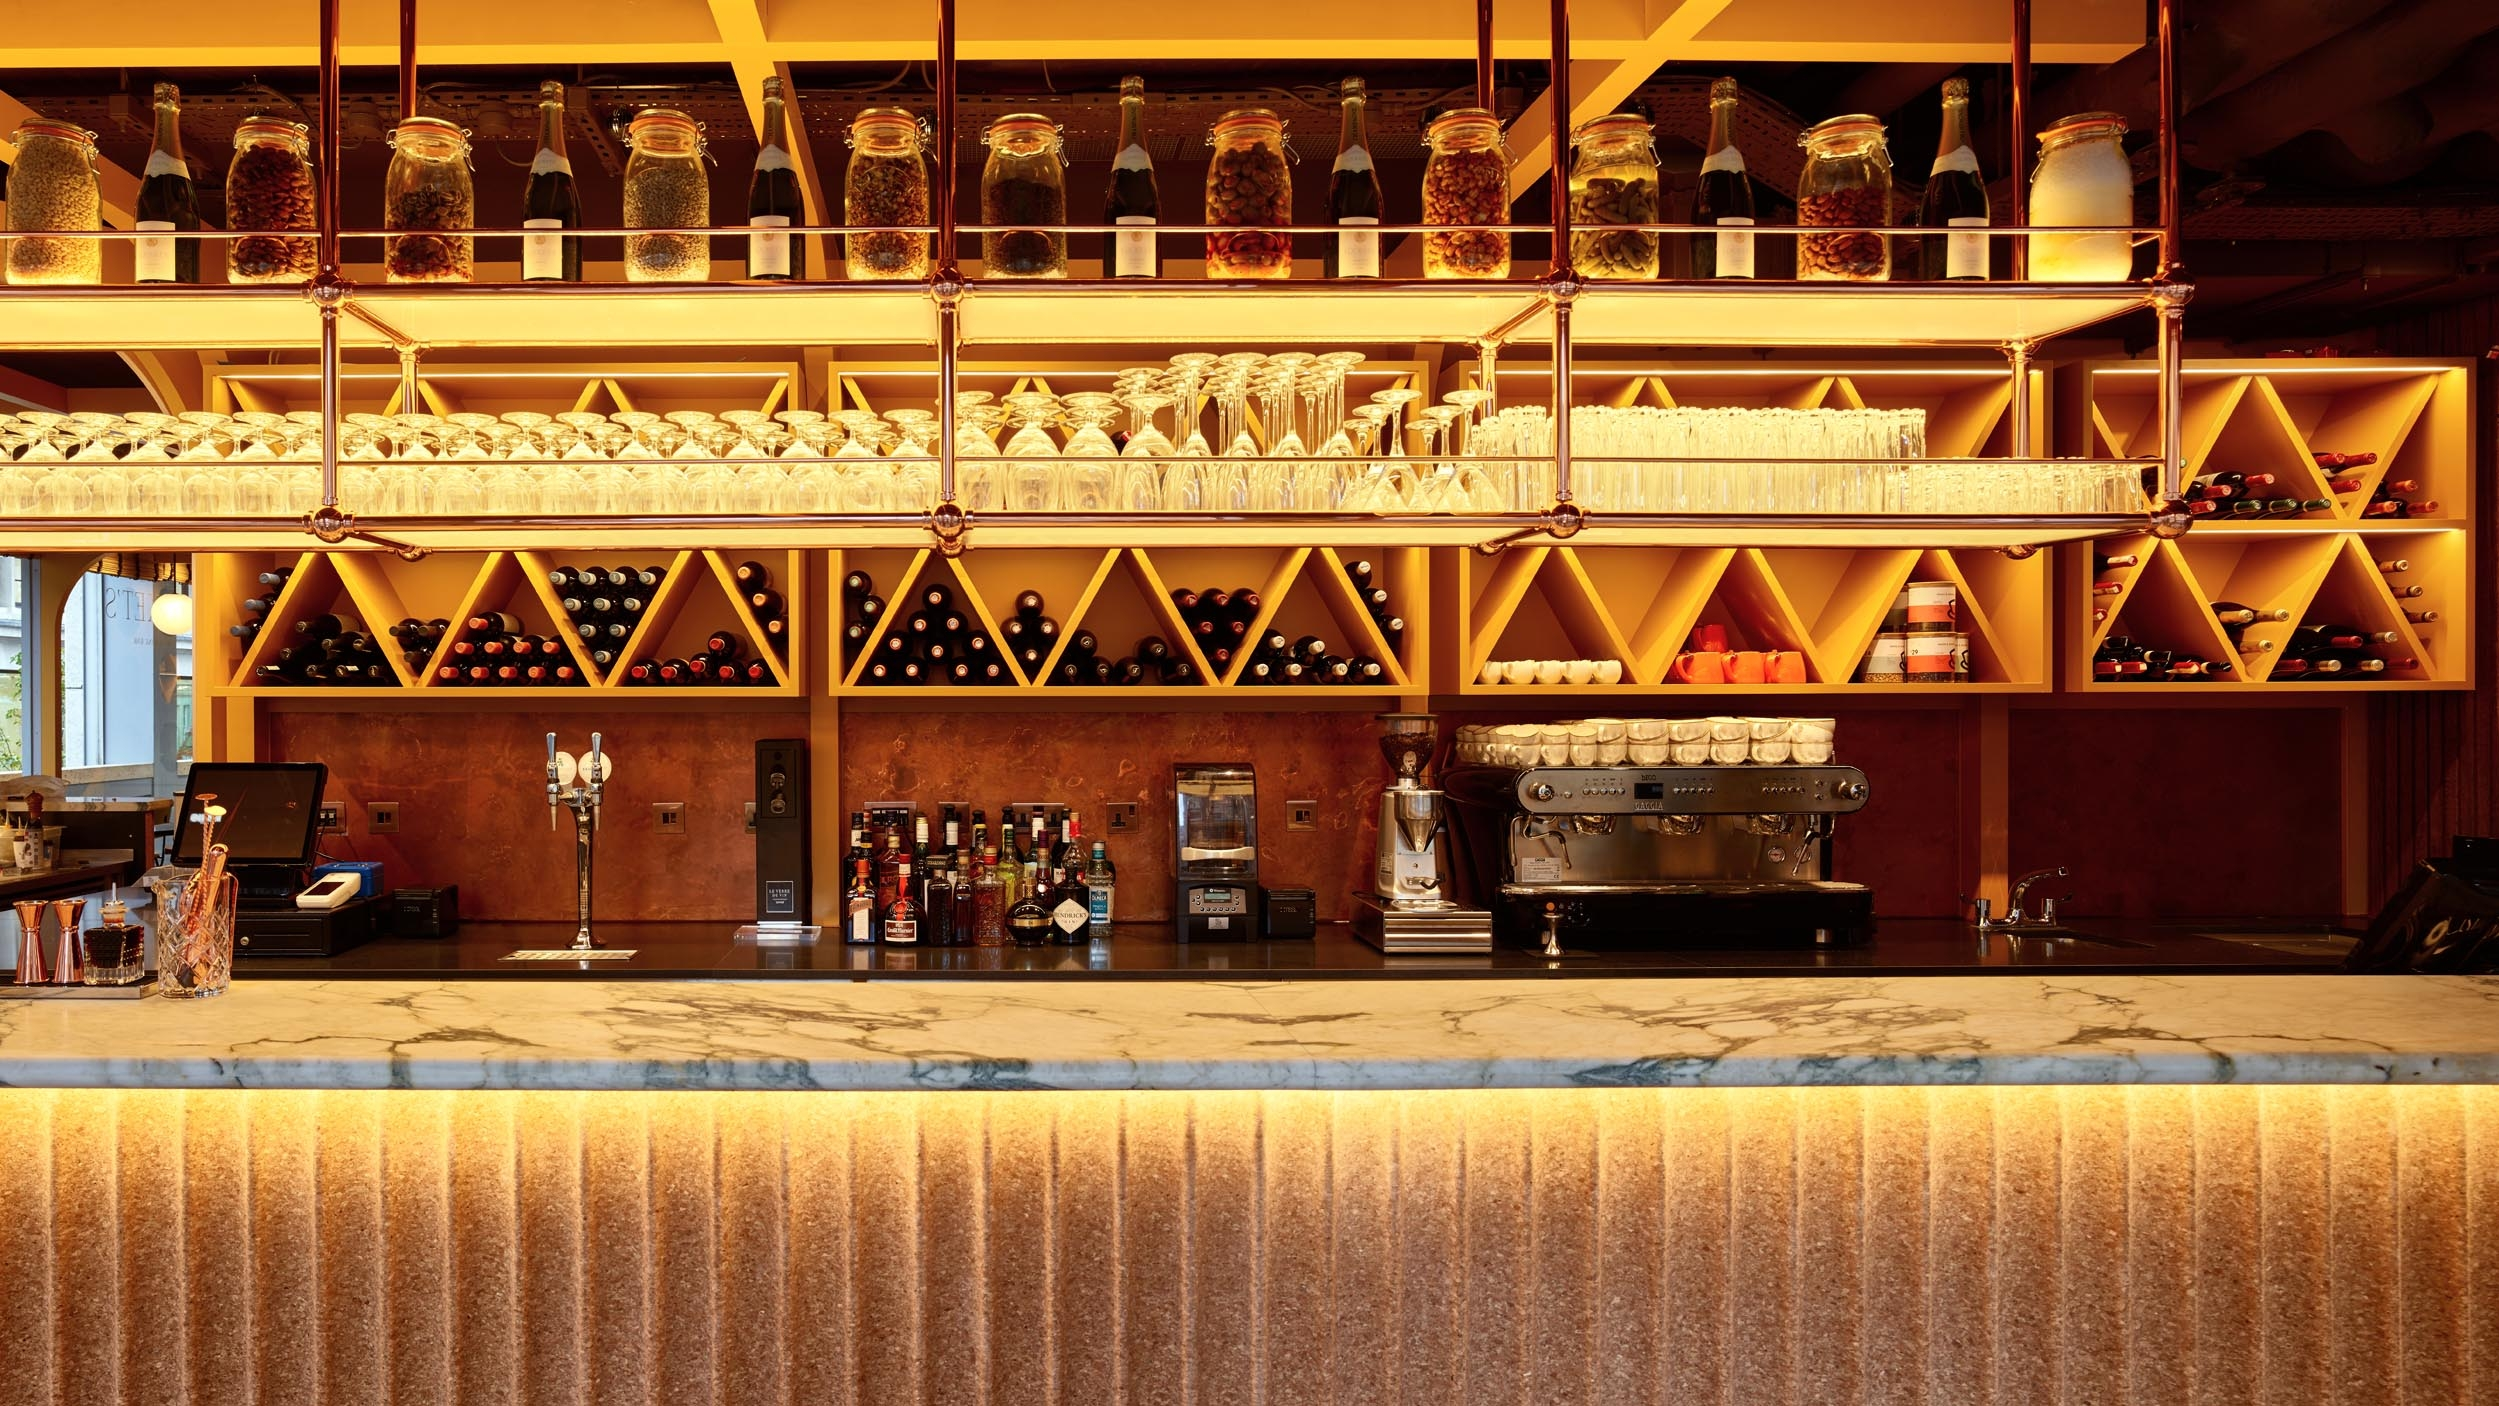 Bar - Locket's - RYE Design